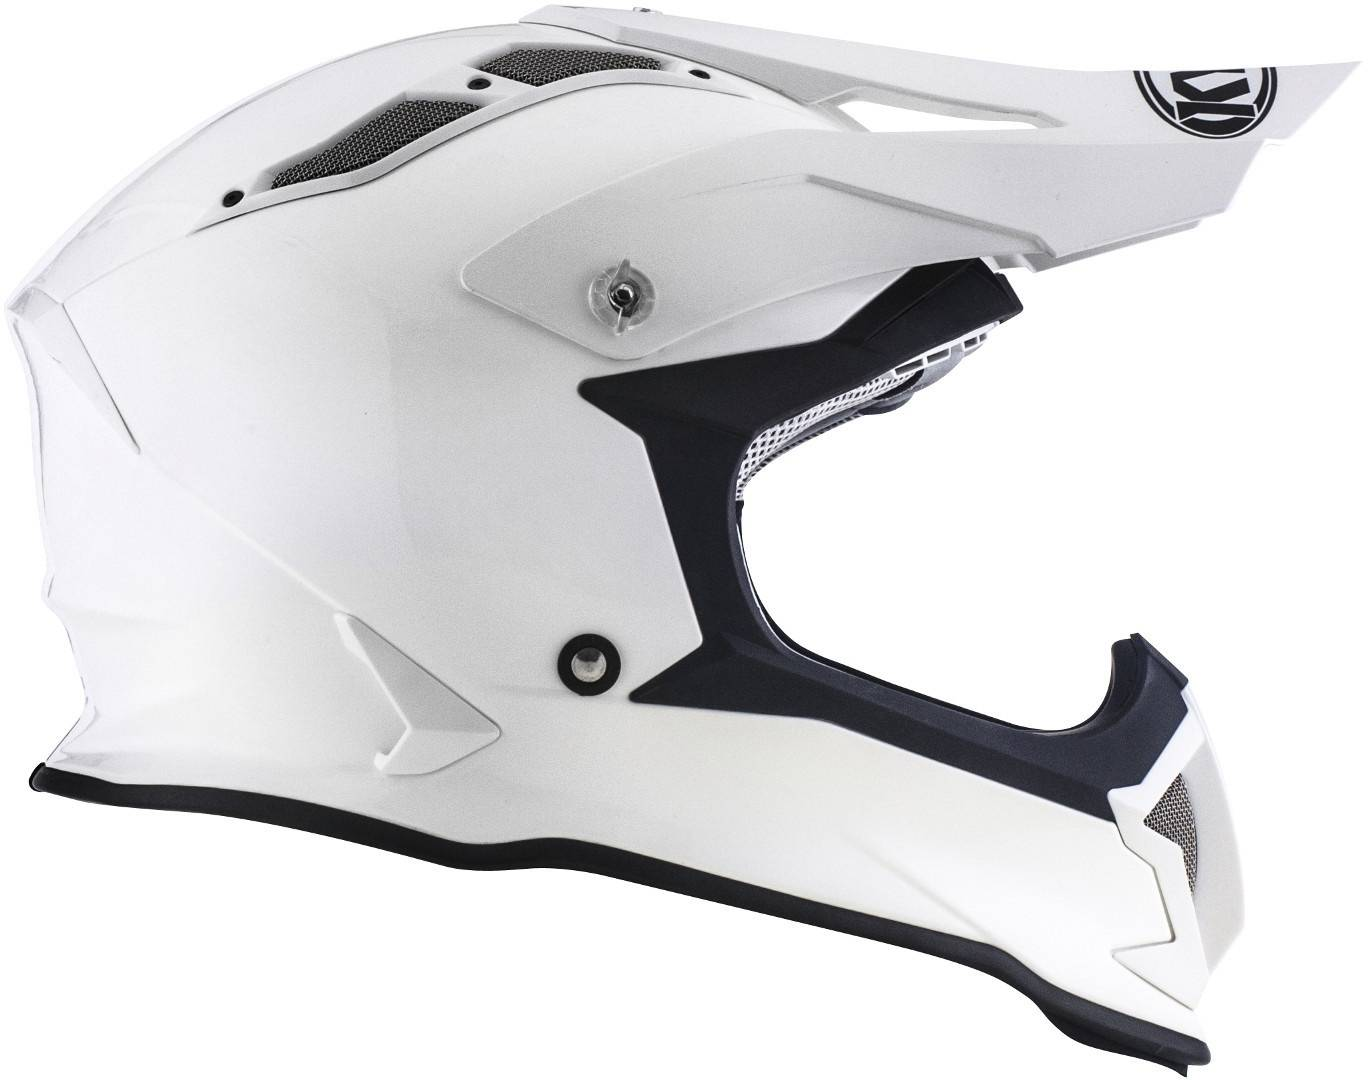 KYT Strike Eagle Plain Motocross Helmet  - Size: 2X-Large